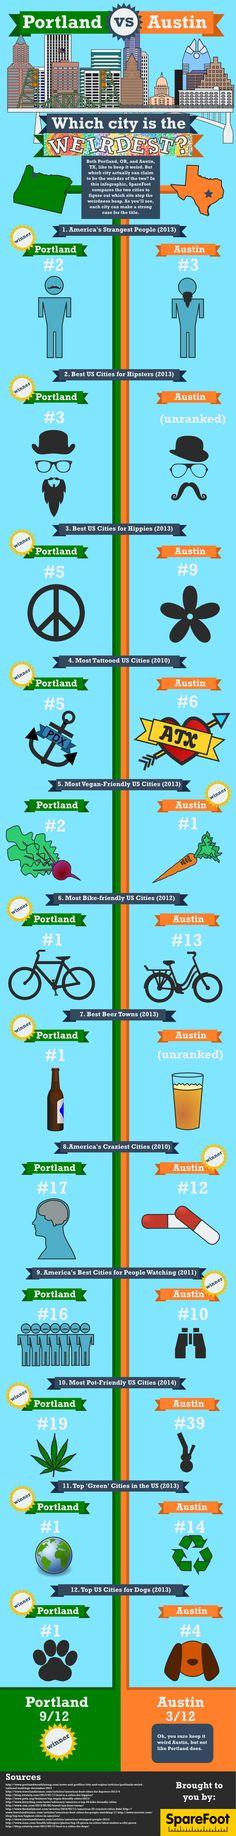 Which city is the weirdest?  Portland vs Austin. Keep Austin Weird or Keep Portland Weird?